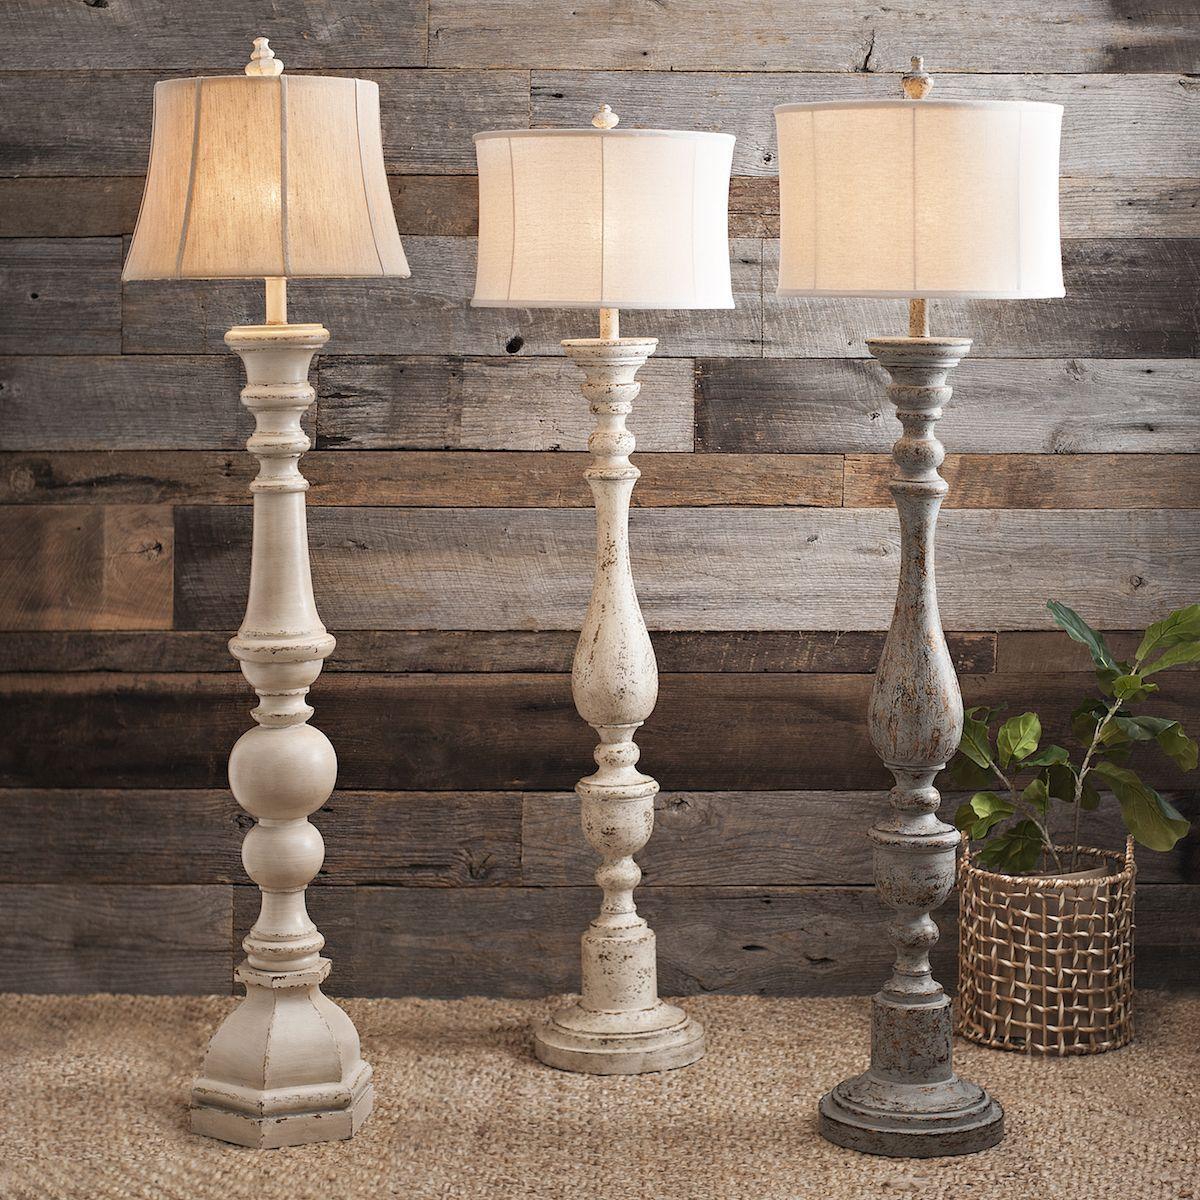 Freshen Up Your Space With A Fabulous Floor Lamp Lampbedroom Diy Floor Lamp Farmhouse Floor Lamps Wood Floor Lamp